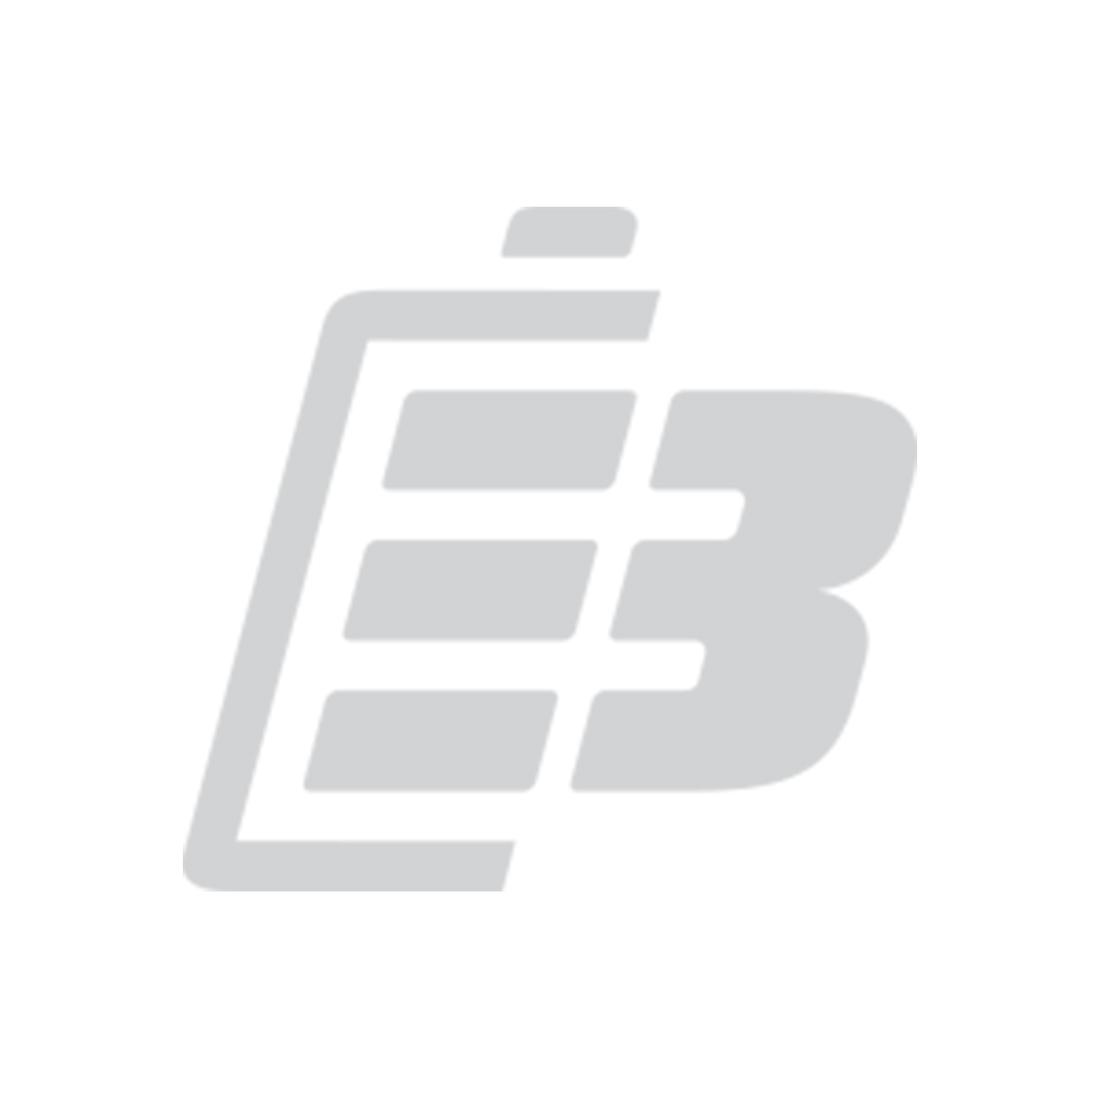 Energizer Alkaline Power LR20 D